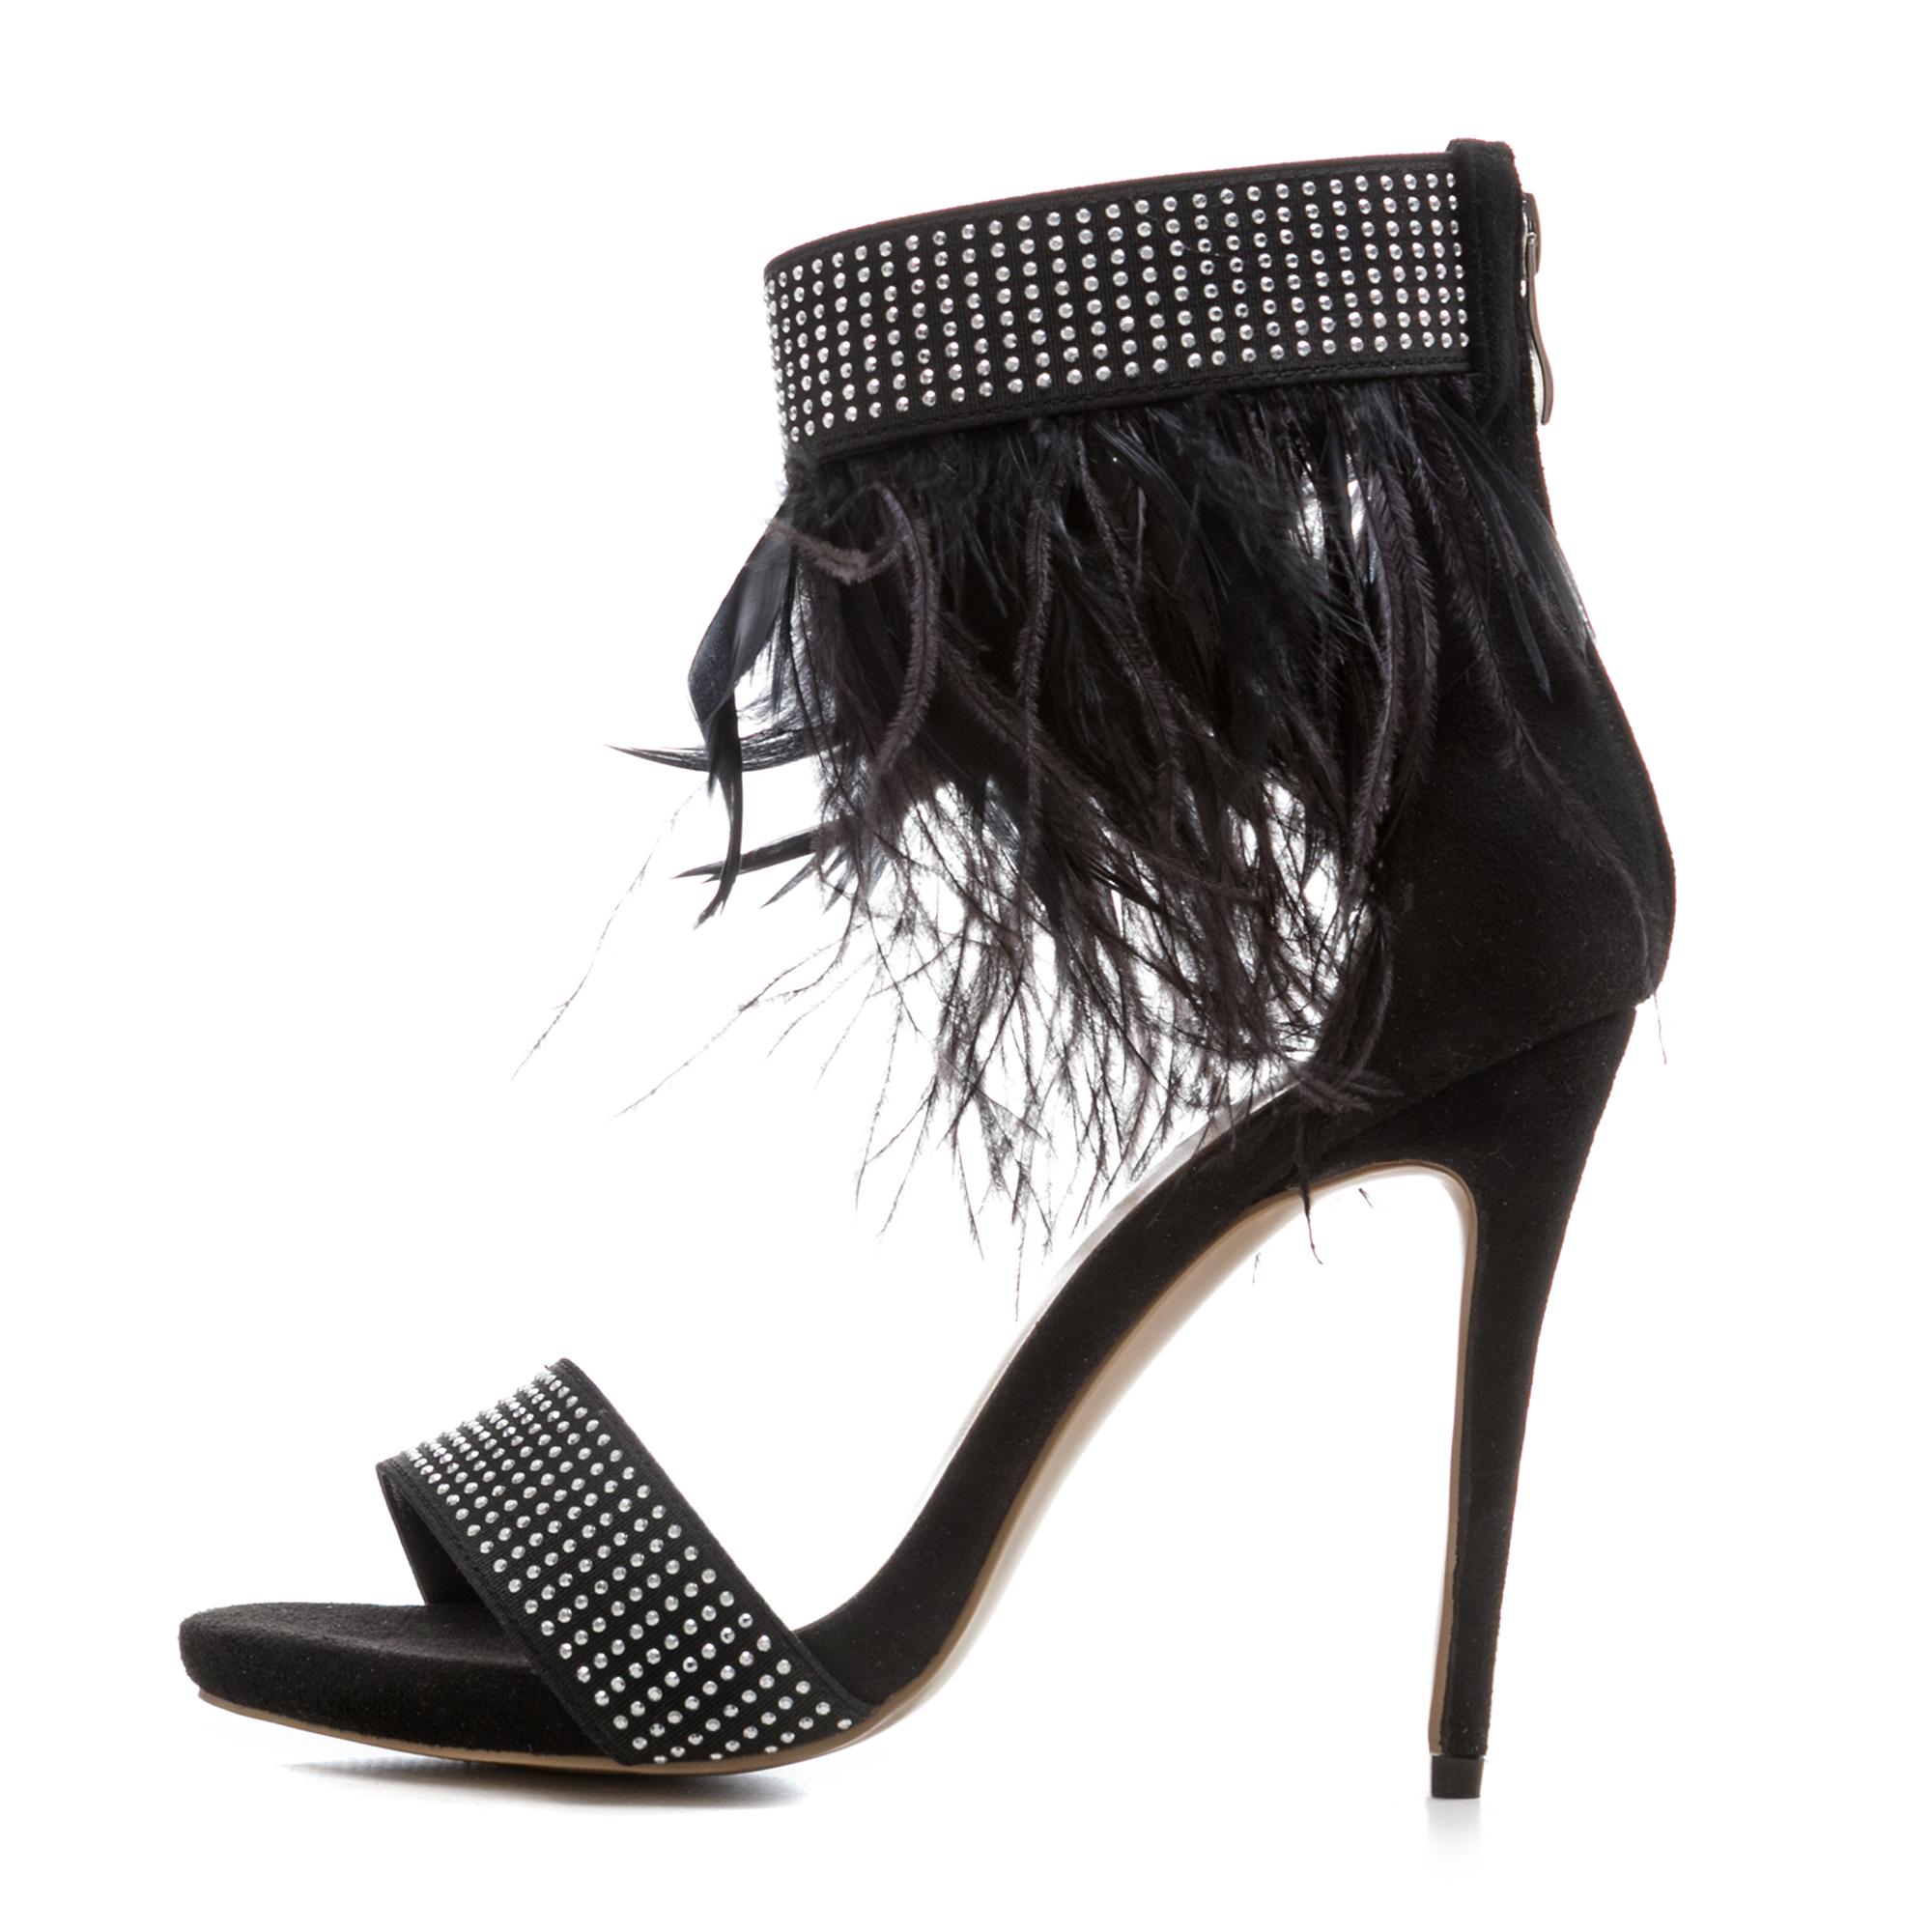 06d3f21ab506 US  60 - Arden Furtado 2018 summer fashion sandals feathers back zipper summer  high heels stilettos ankle strap shoes sexy ladies women -  www.ardenfurtado. ...